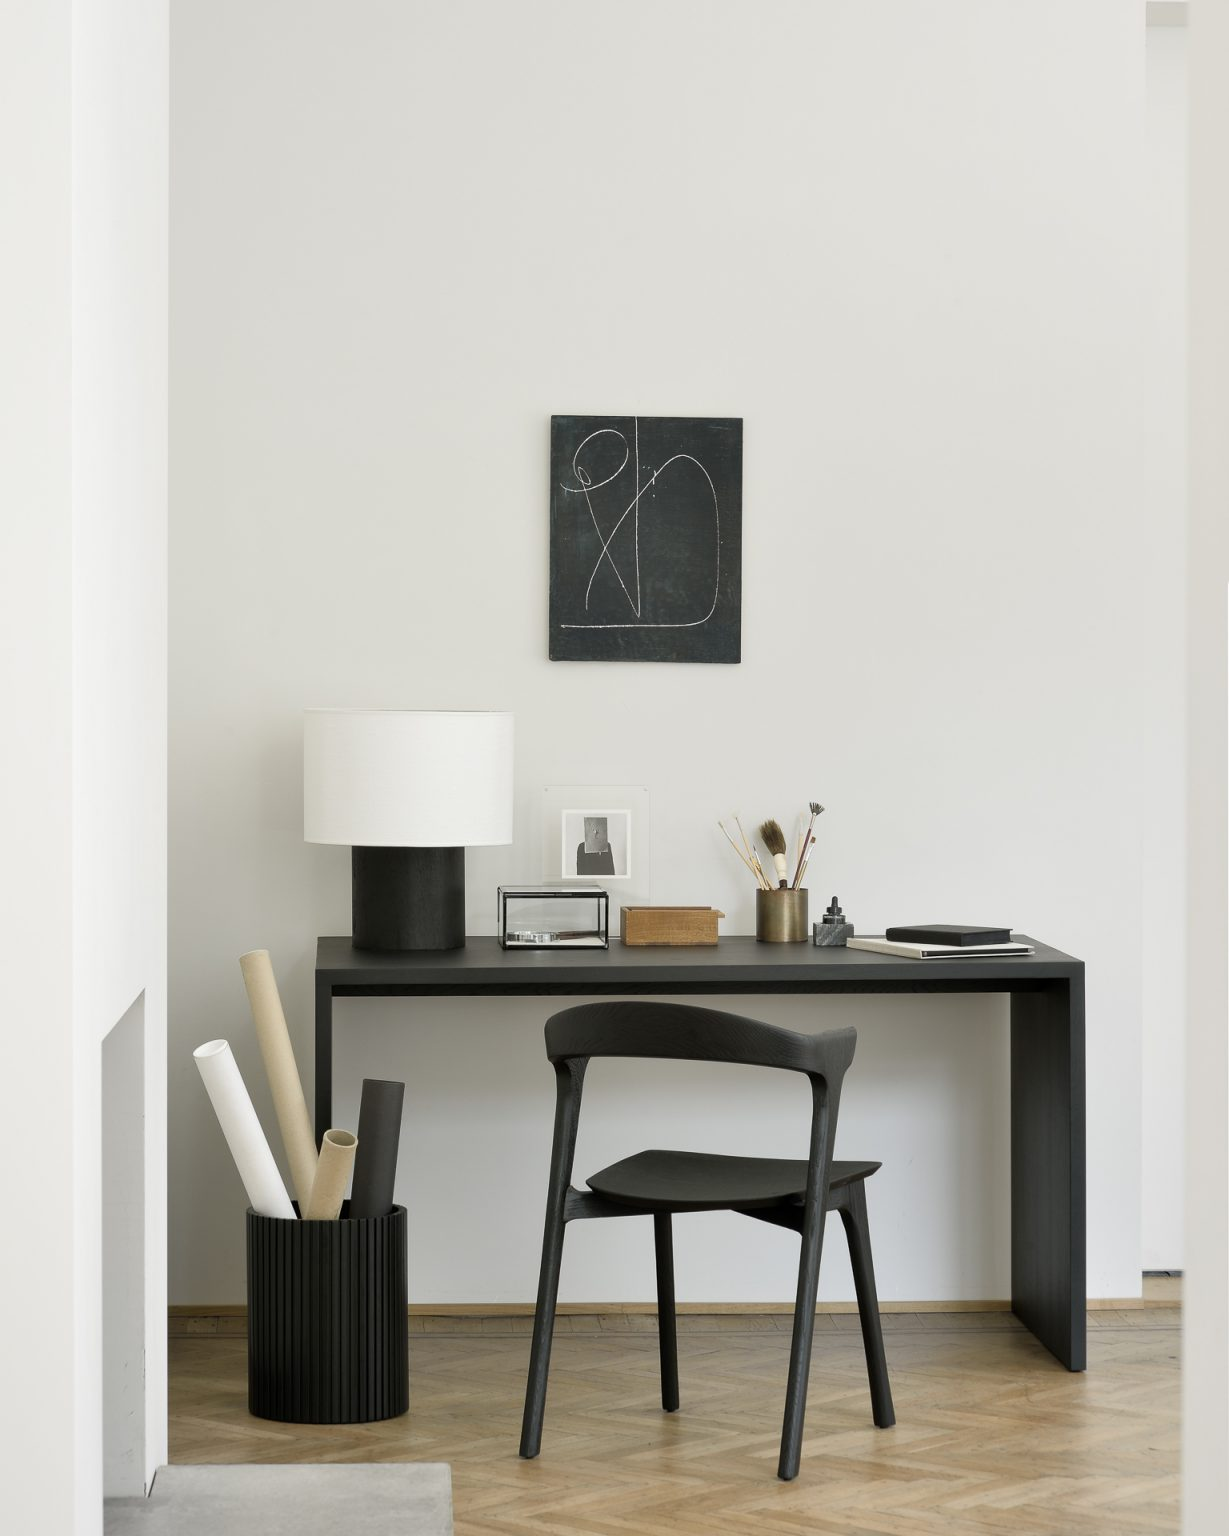 Biennale Interieur - Belgium's leading design and interior event - 50008_oak_black_u_desk_51491_oak_black_bok_chair_29771_mahogany_black_roller_max_waste_paper_basket_1_web.jpg